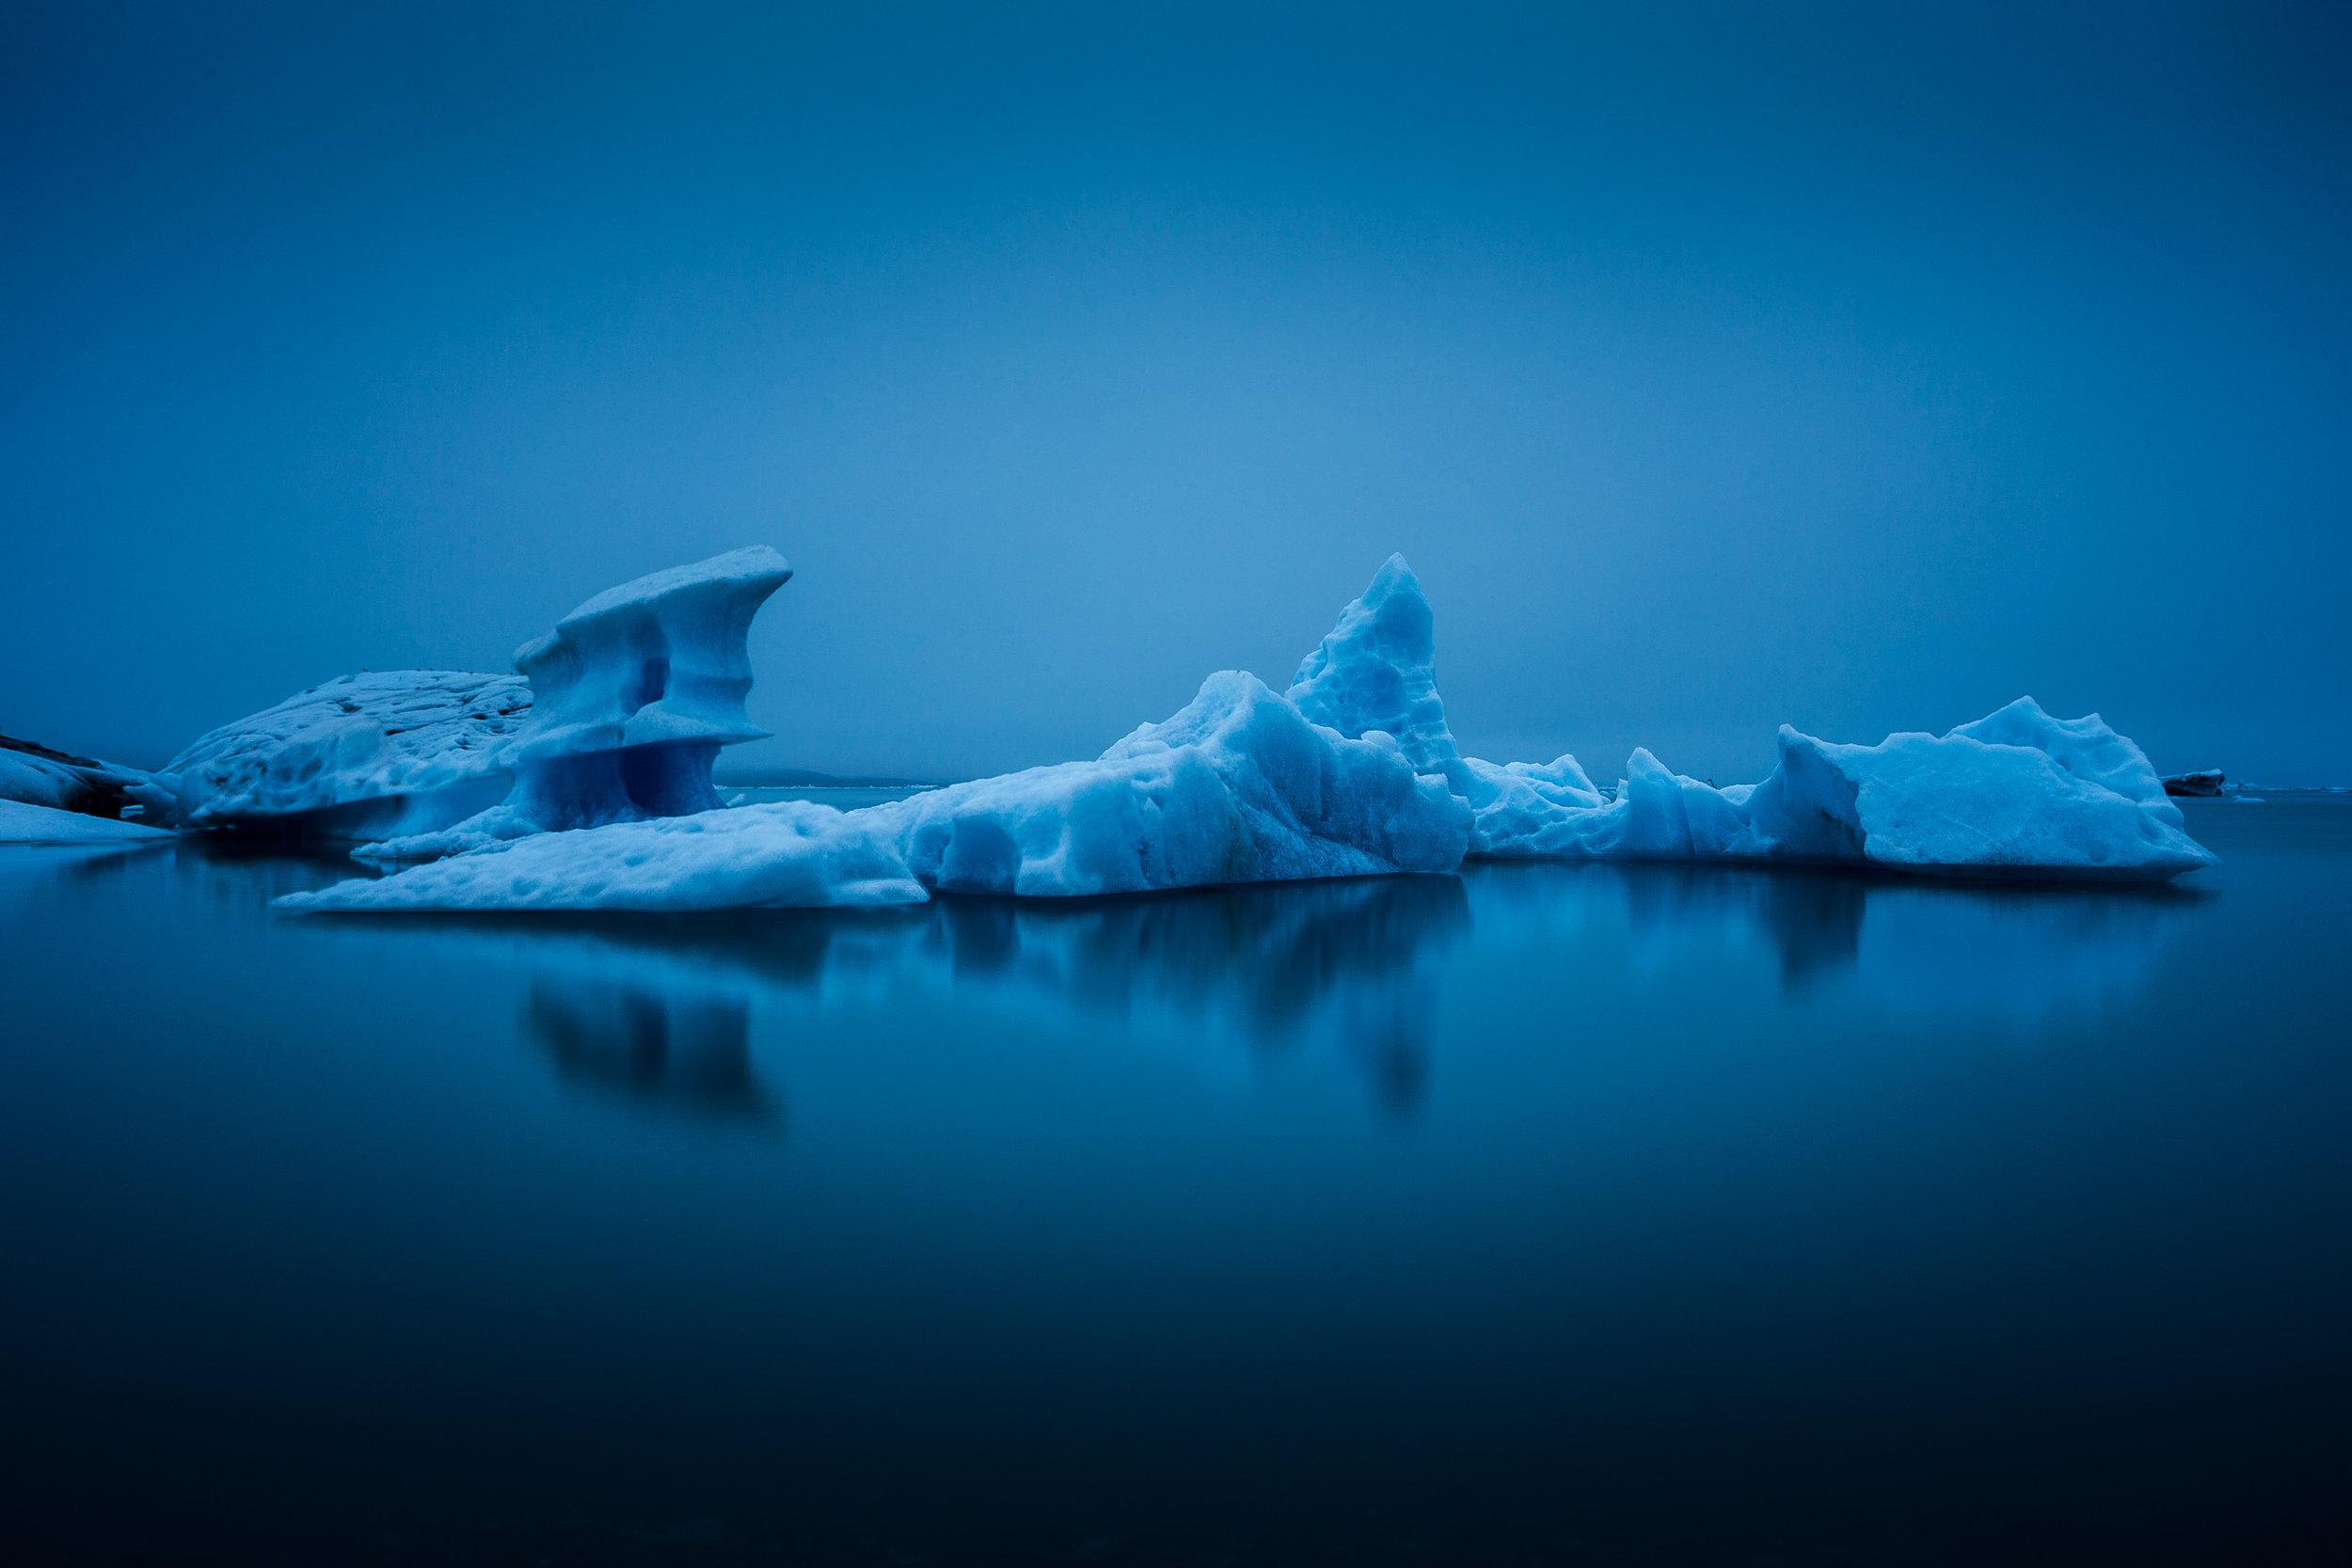 Iceland, Jökulsárlón Glacial Lagoon - May 6th, 2017-1.jpg